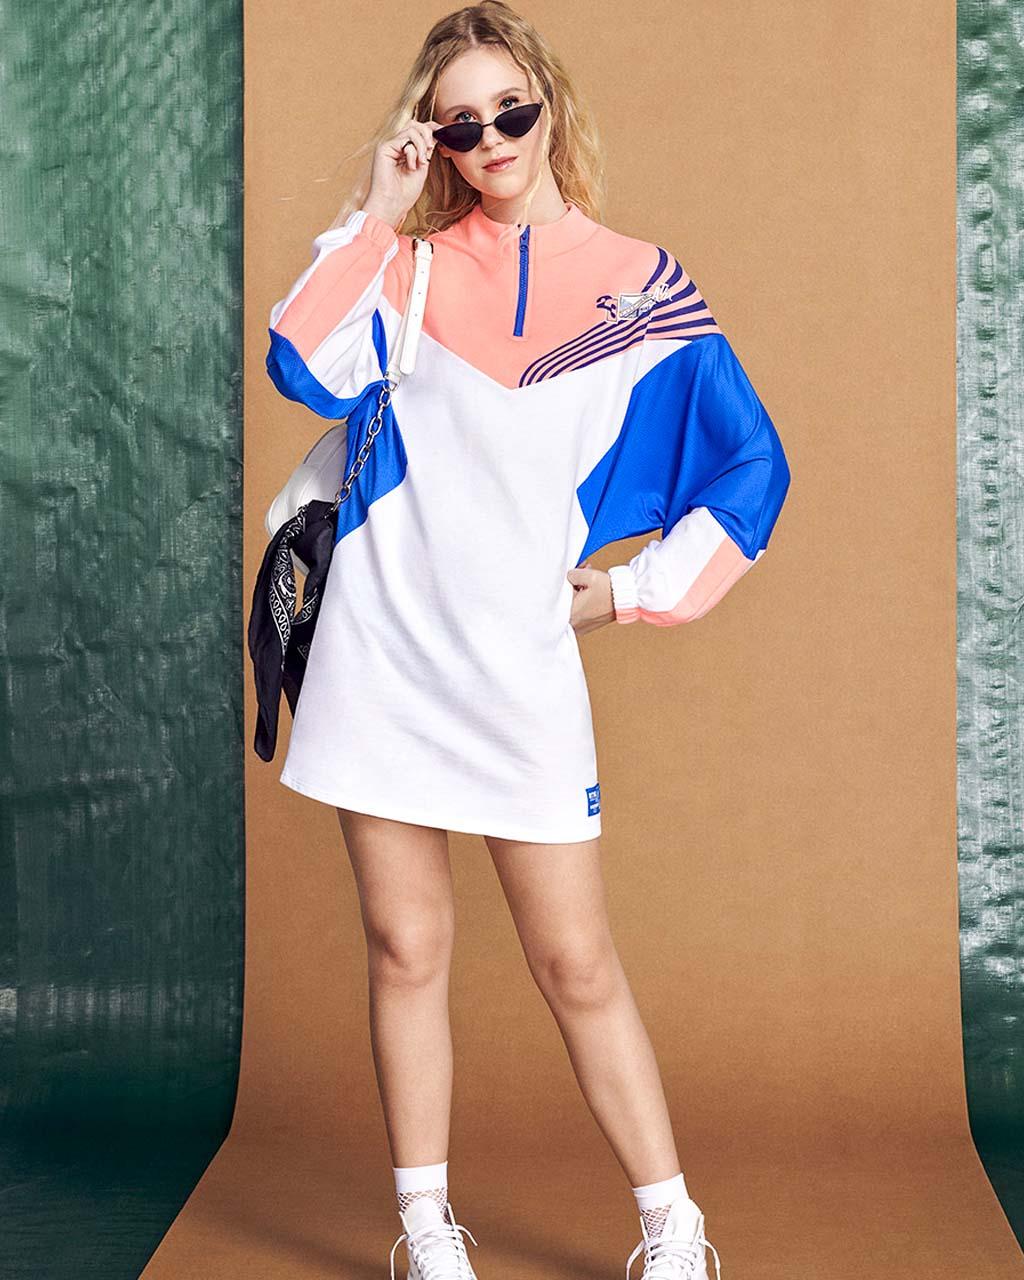 Vestido Teen Moletom com Recortes Tricolor Neon Royal Off Authoria